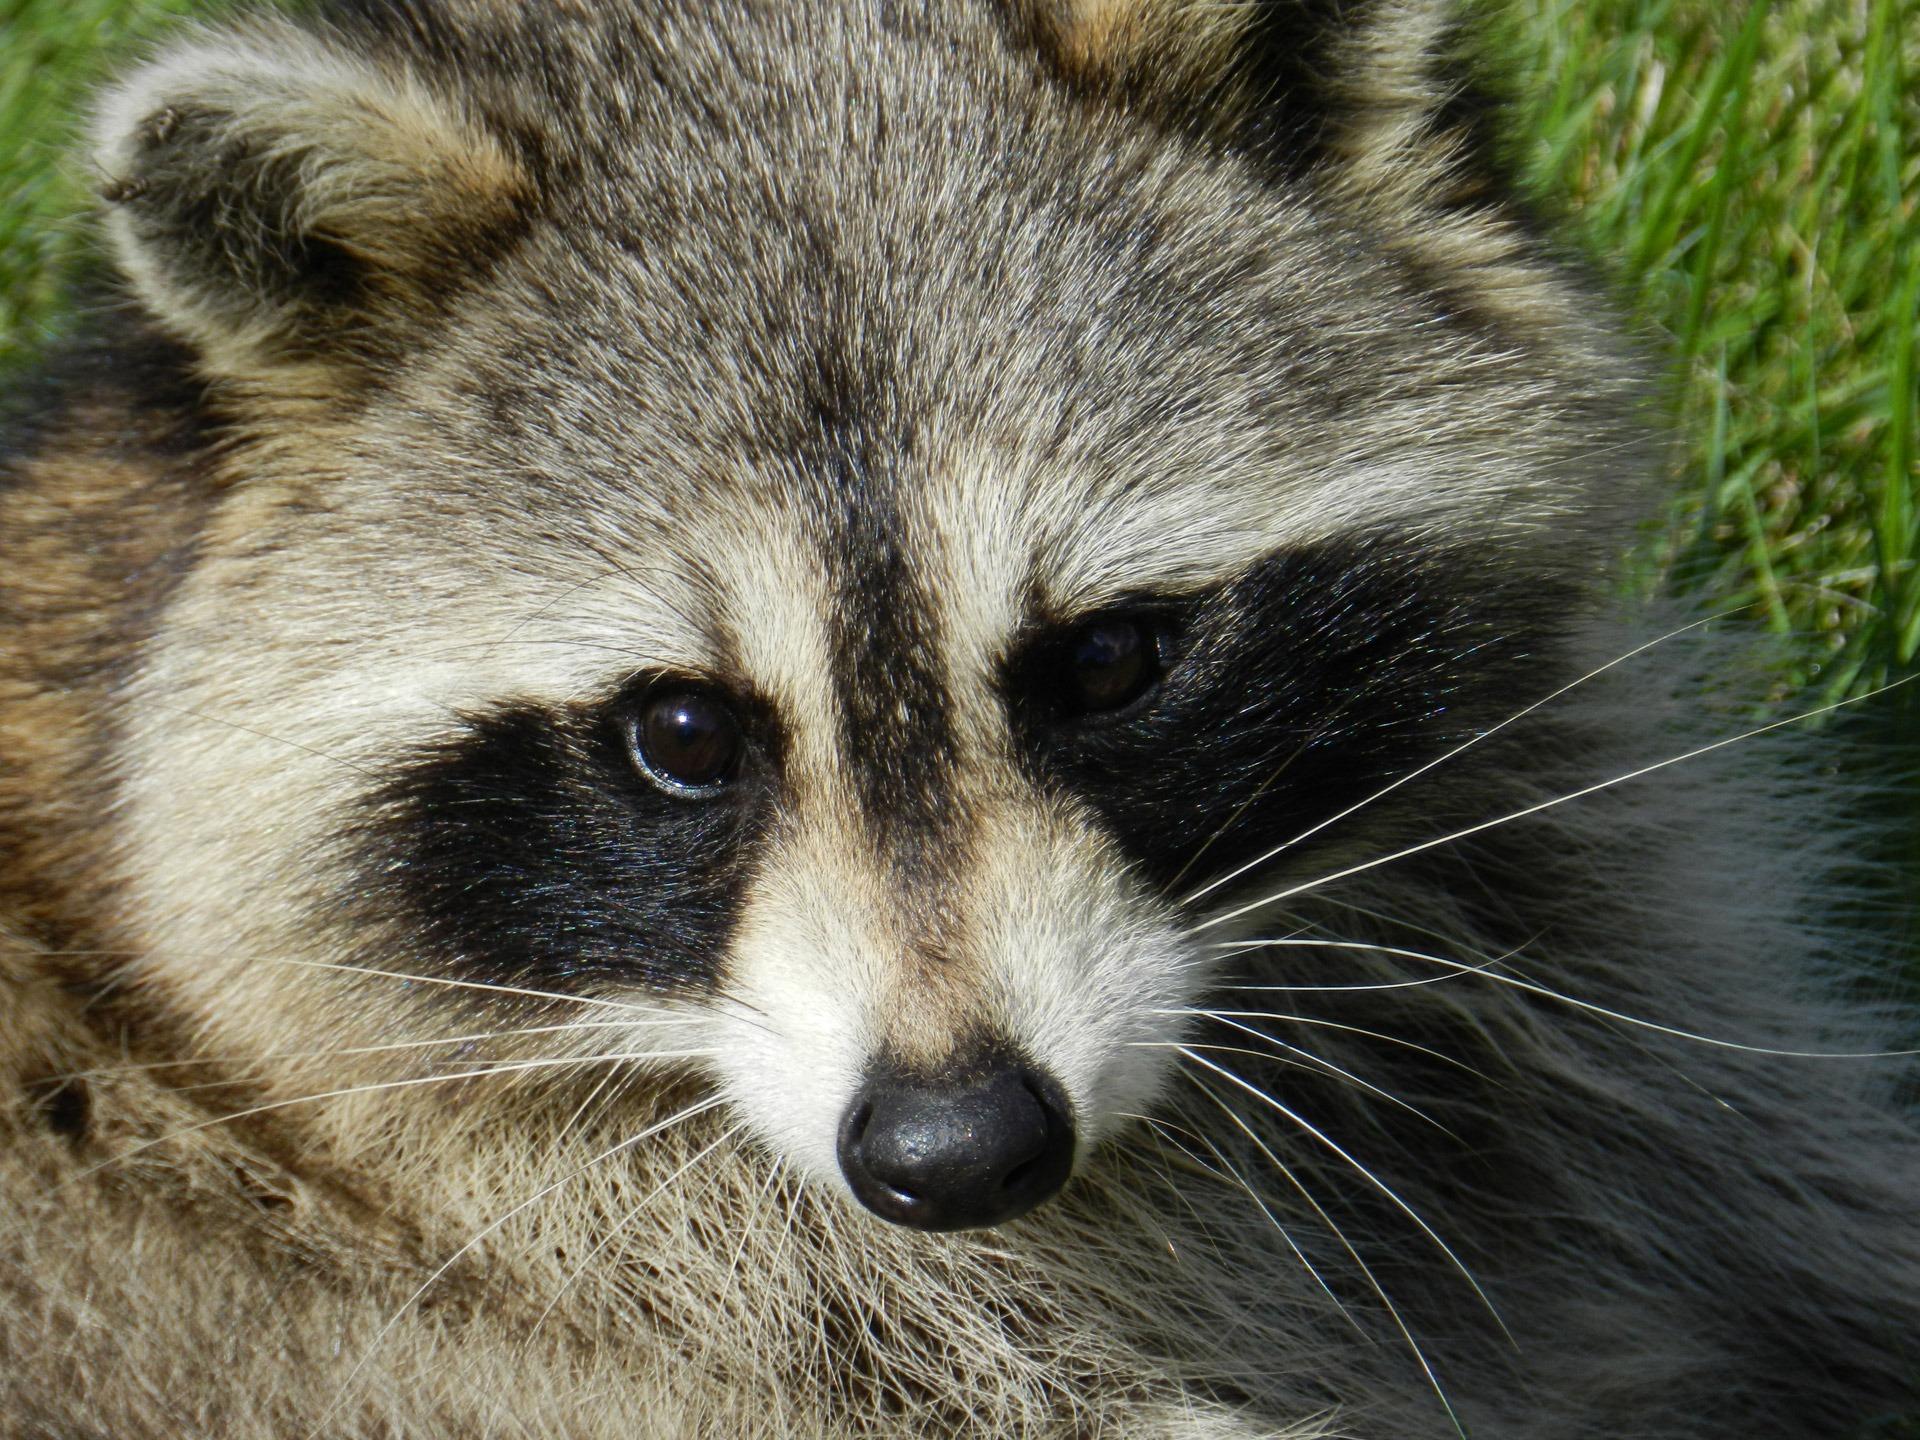 Free Images : animal, cute, wildlife, portrait, mammal ...